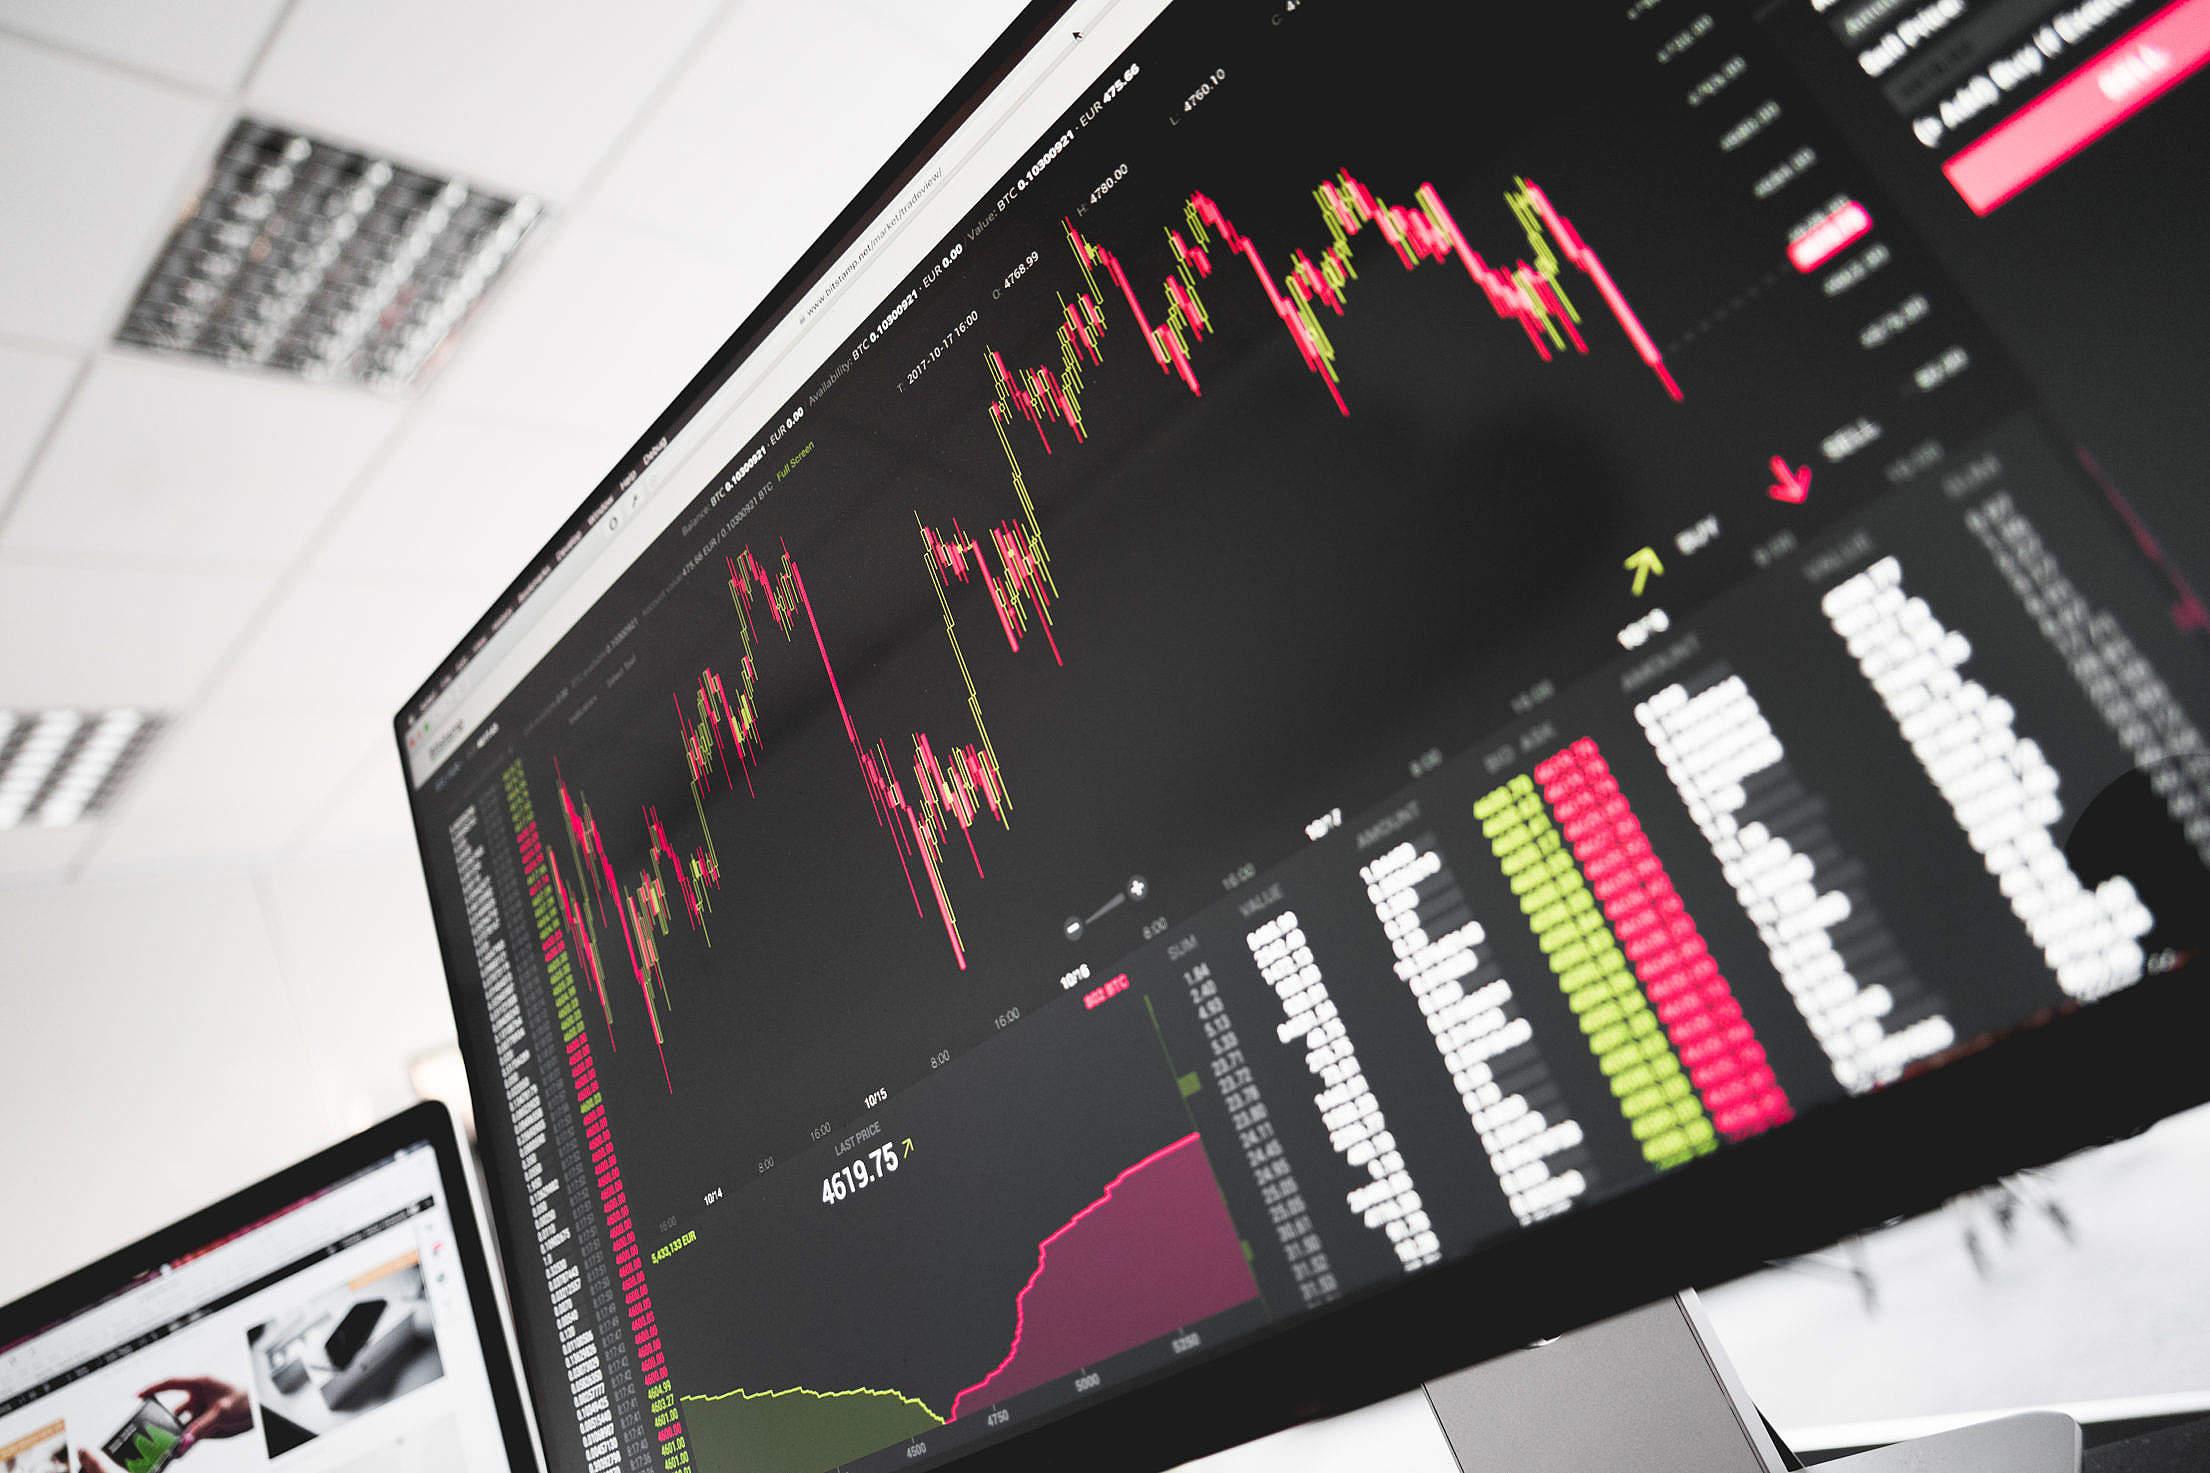 Stock Exchange Office Bitcoin BTC Live Price Chart Free Stock Photo